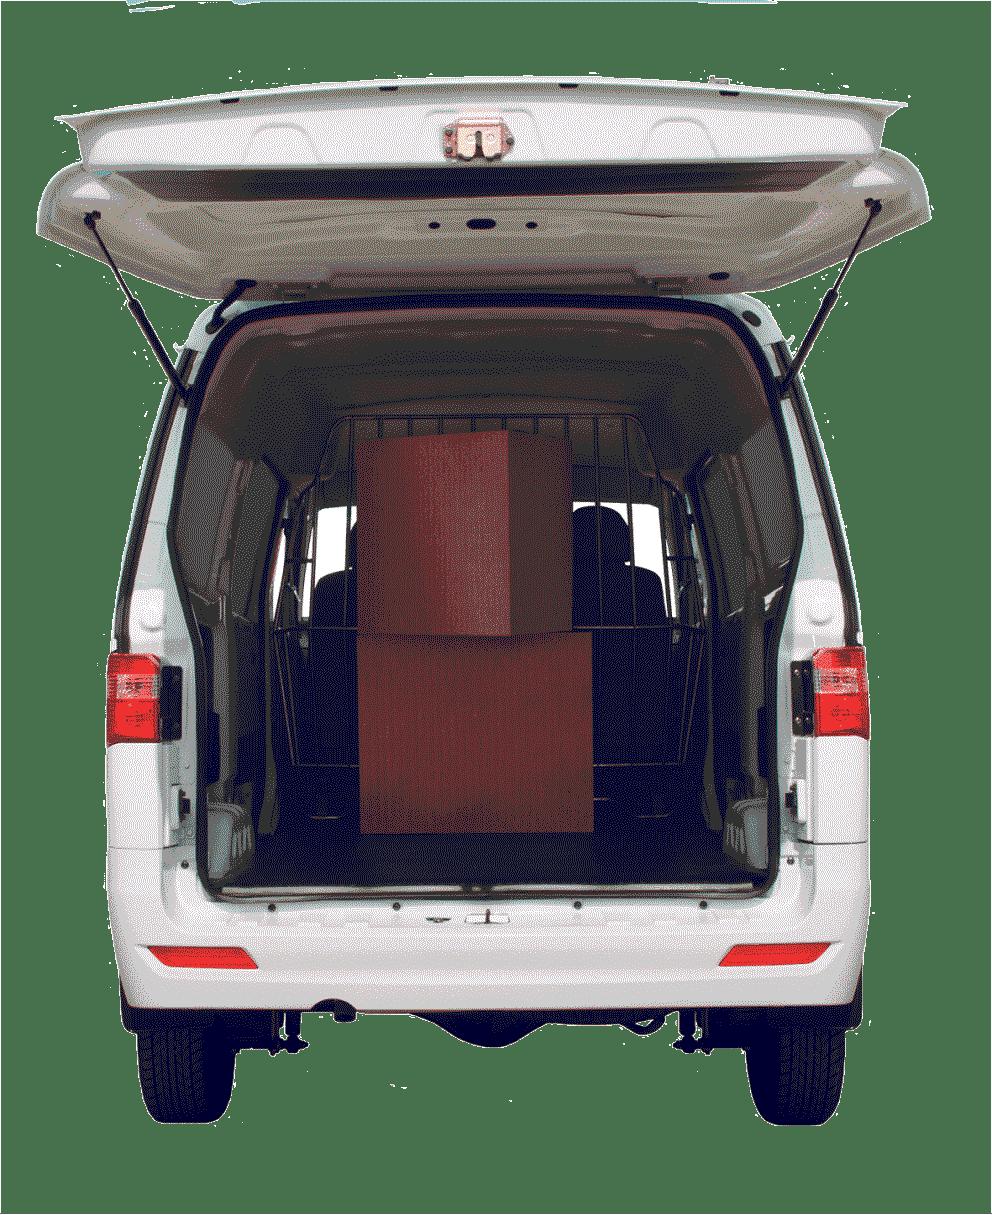 shineray-x30l-van-cargo